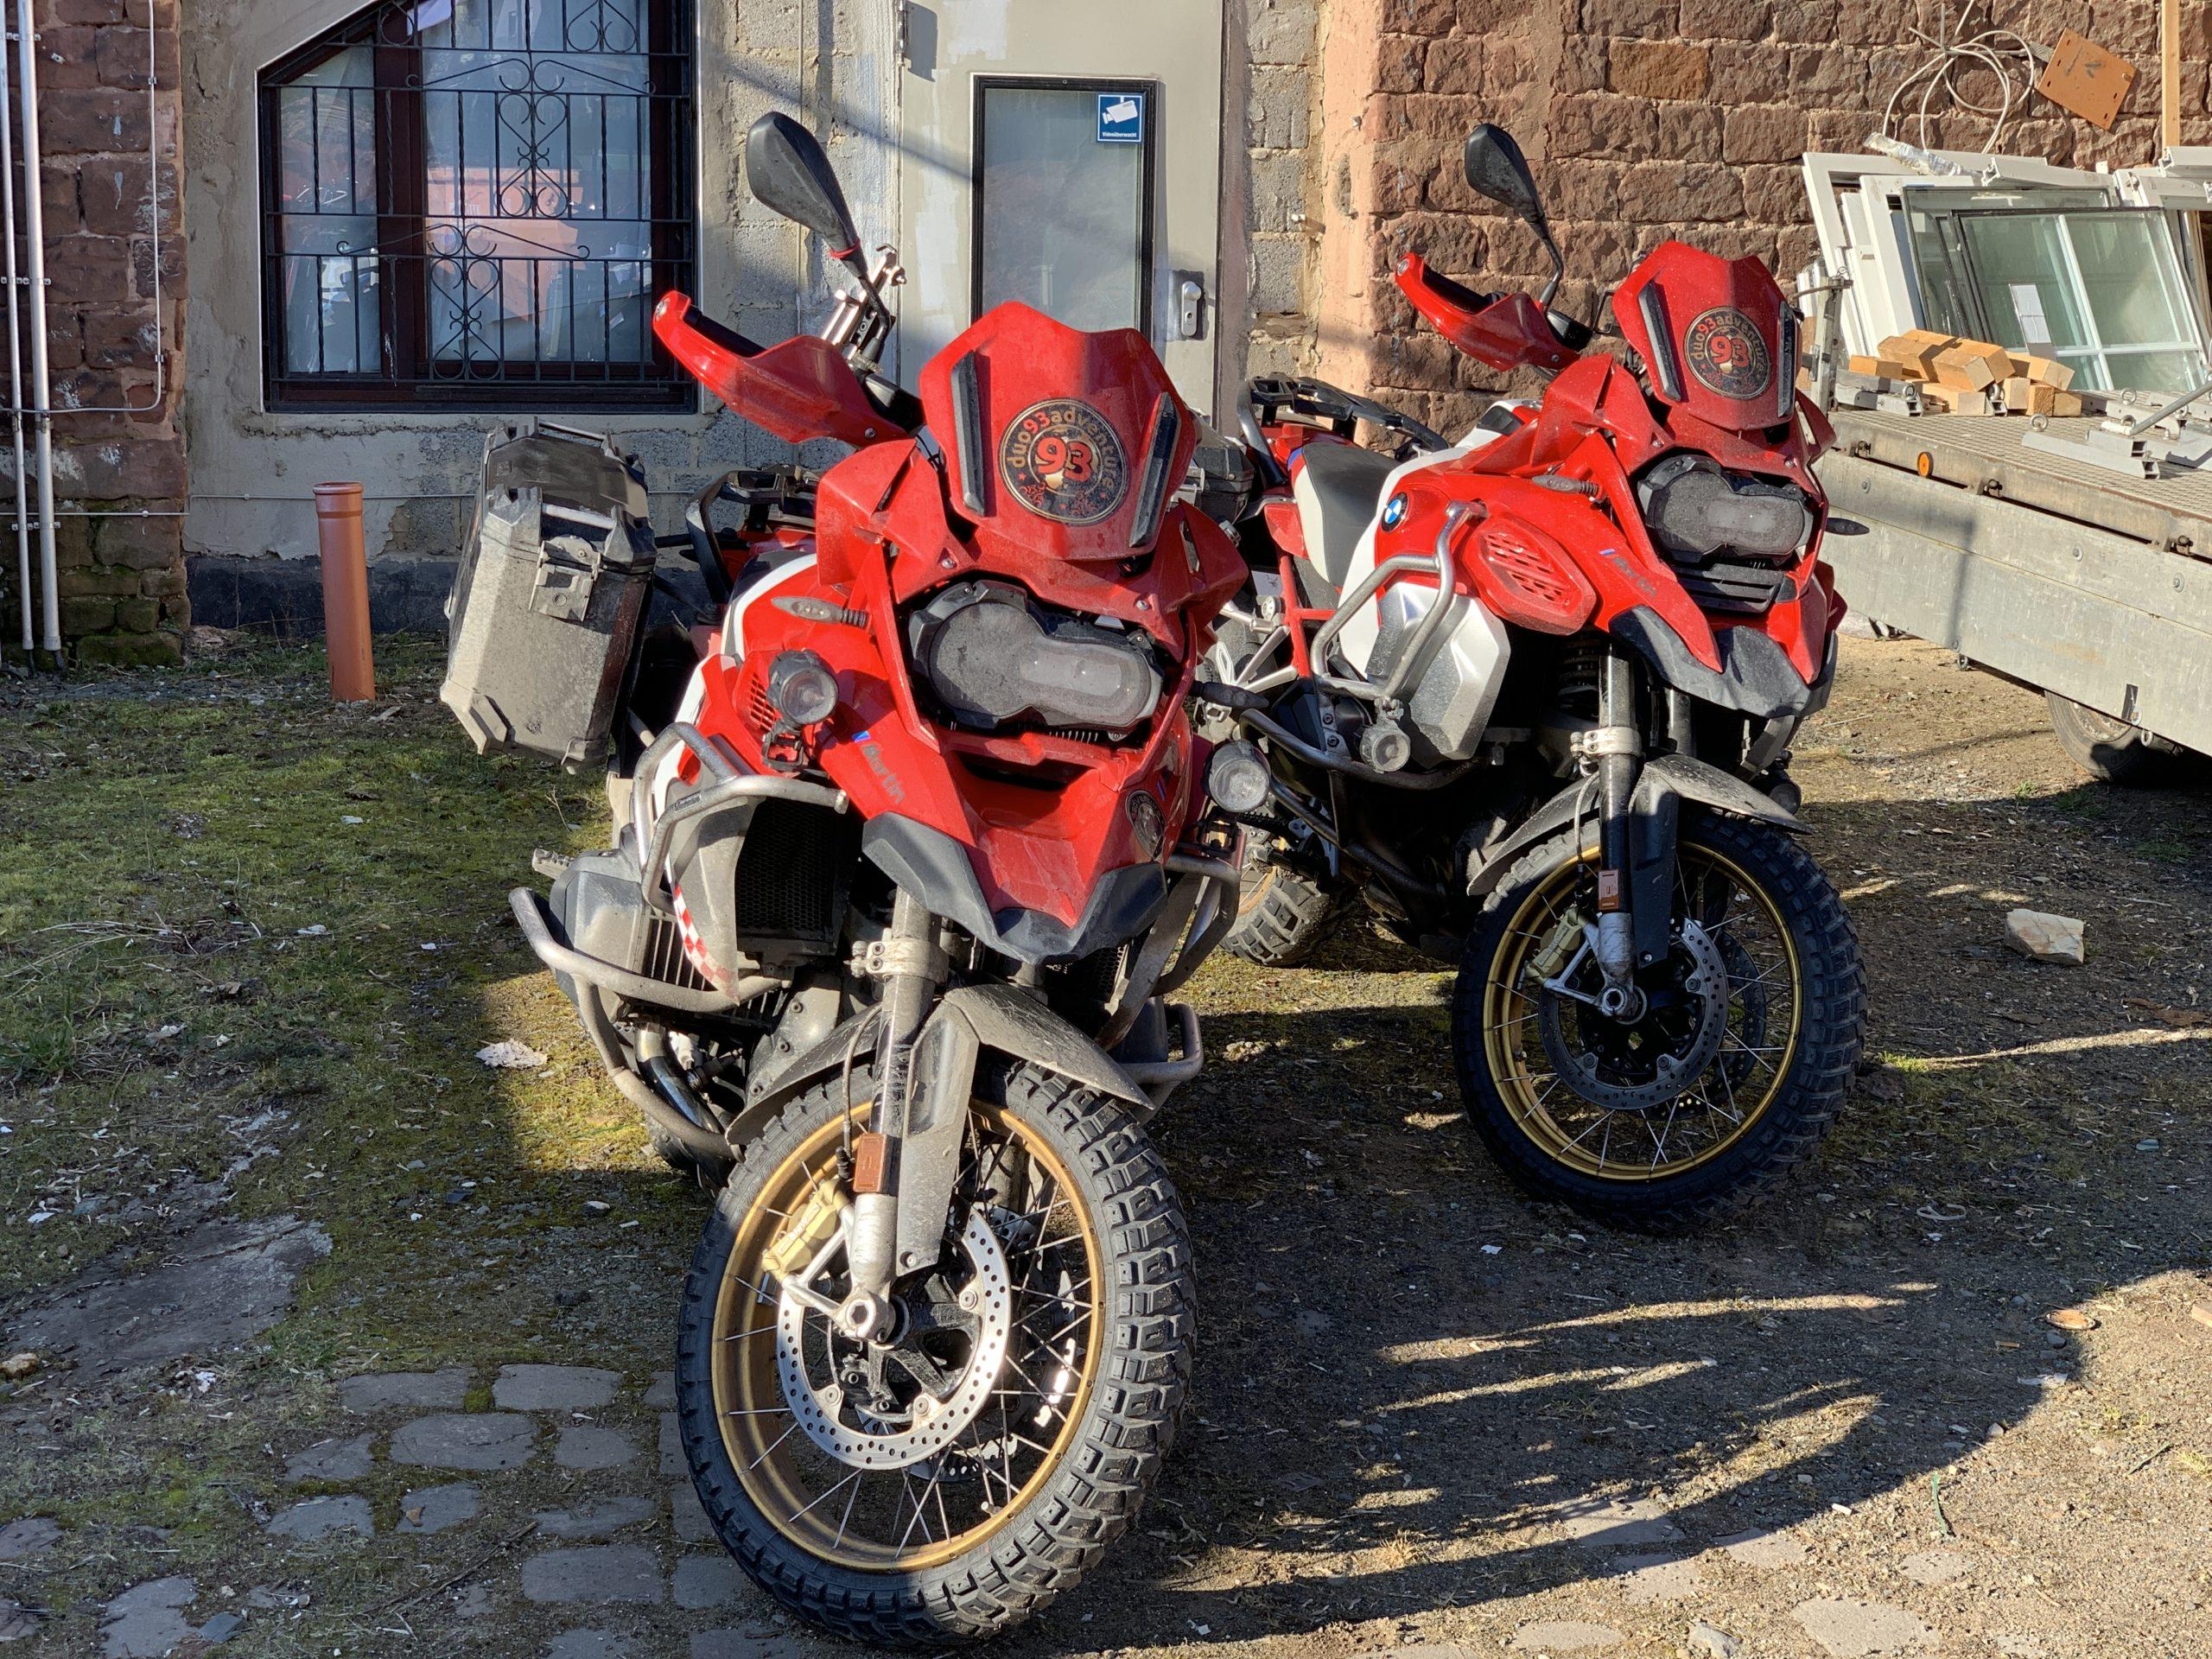 BMW GS1250 - duo93adventure